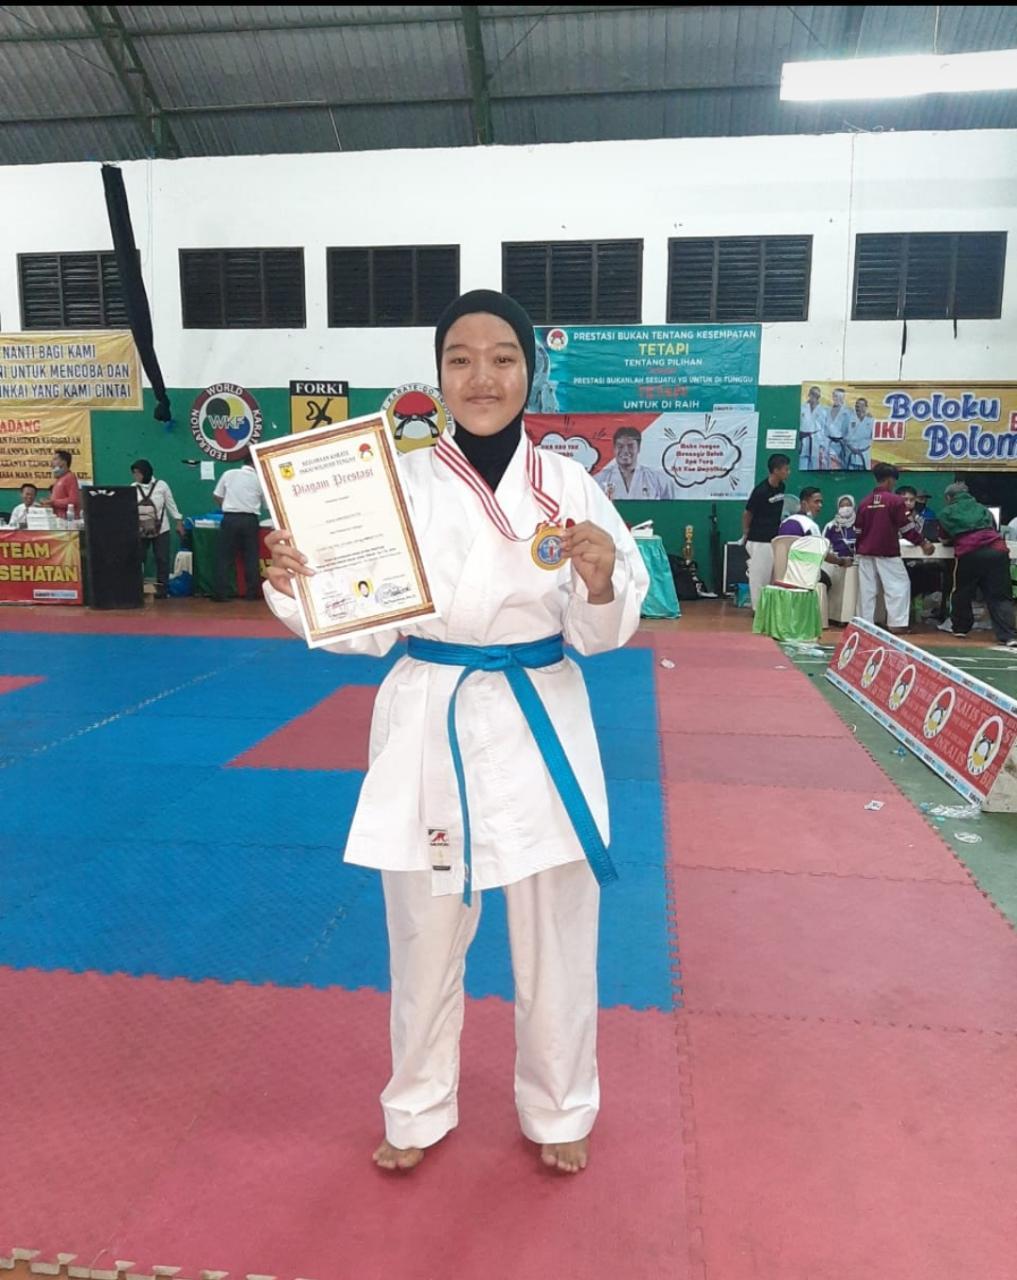 "Riska Ananda Putri kelas XI IPS 3 Juara 1 Kejuaran Karate INKAI Wilayah Tengah""Piala Ketua Umum INKAI Jawa Timur Ke-1 tahun 2020 antar Pelajar se-Jawa Timur di Pasuruan."